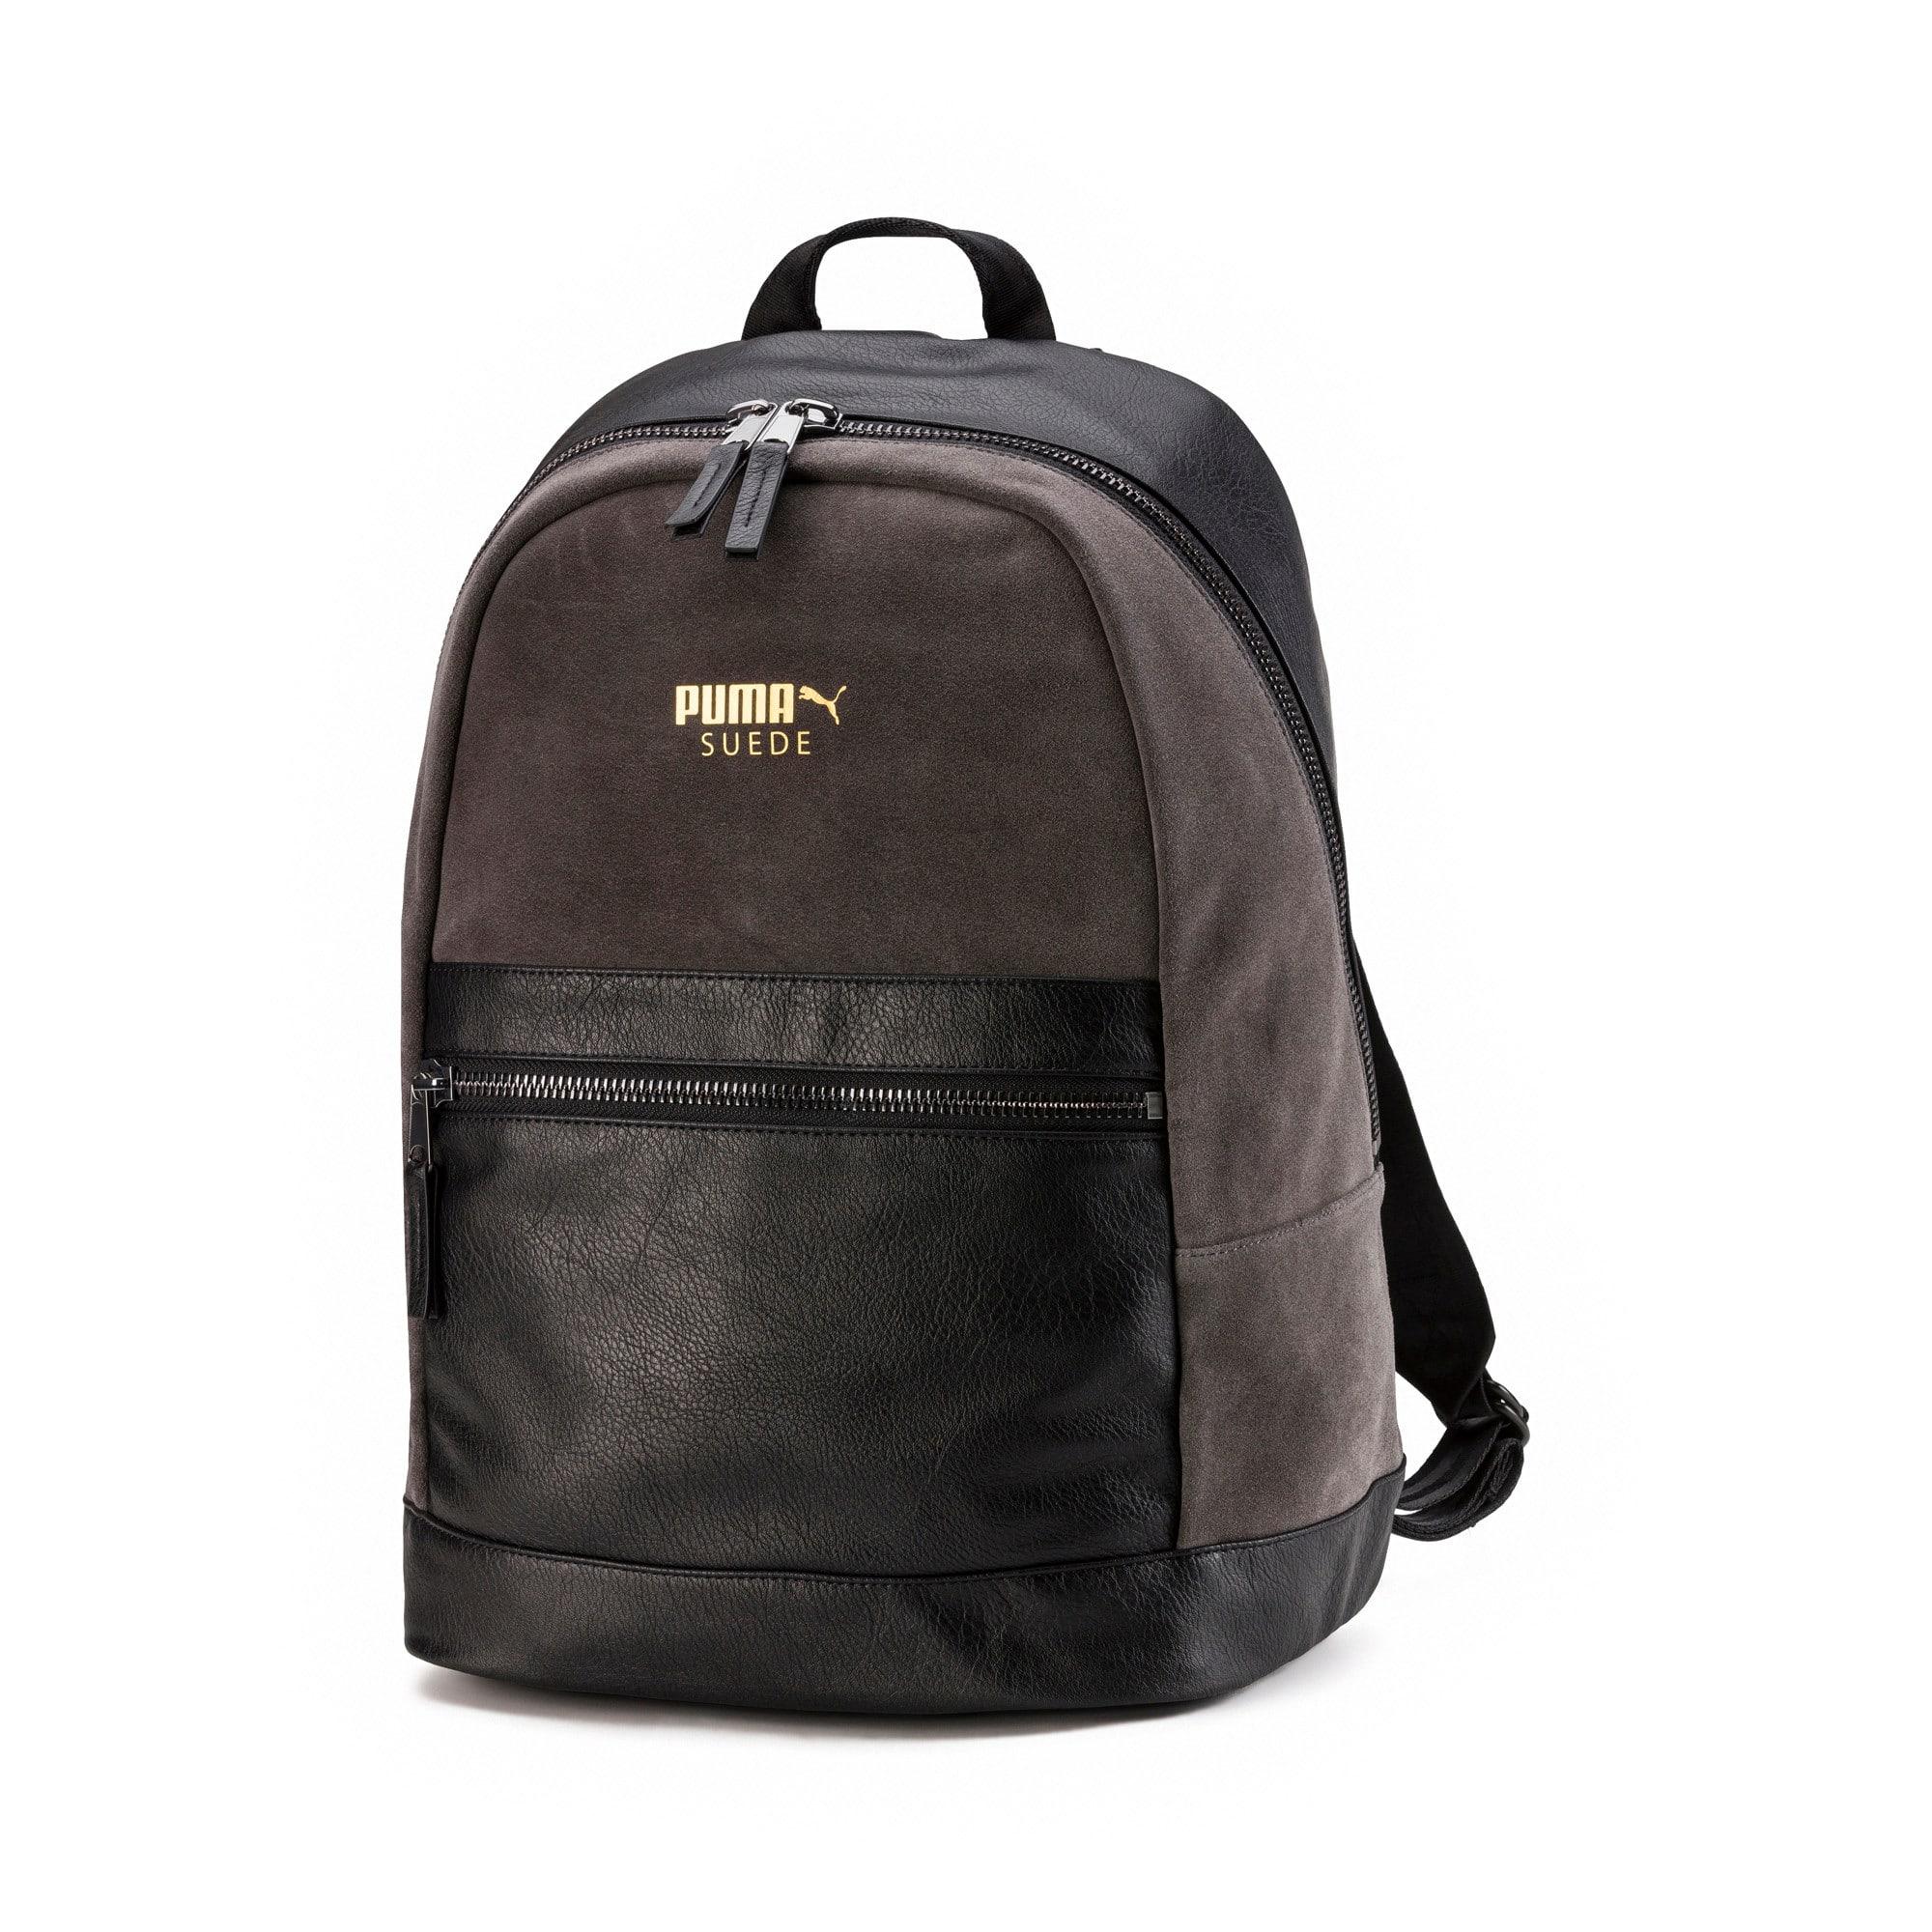 Thumbnail 1 of Suede Lux Backpack, Dark Shadow-Puma Black, medium